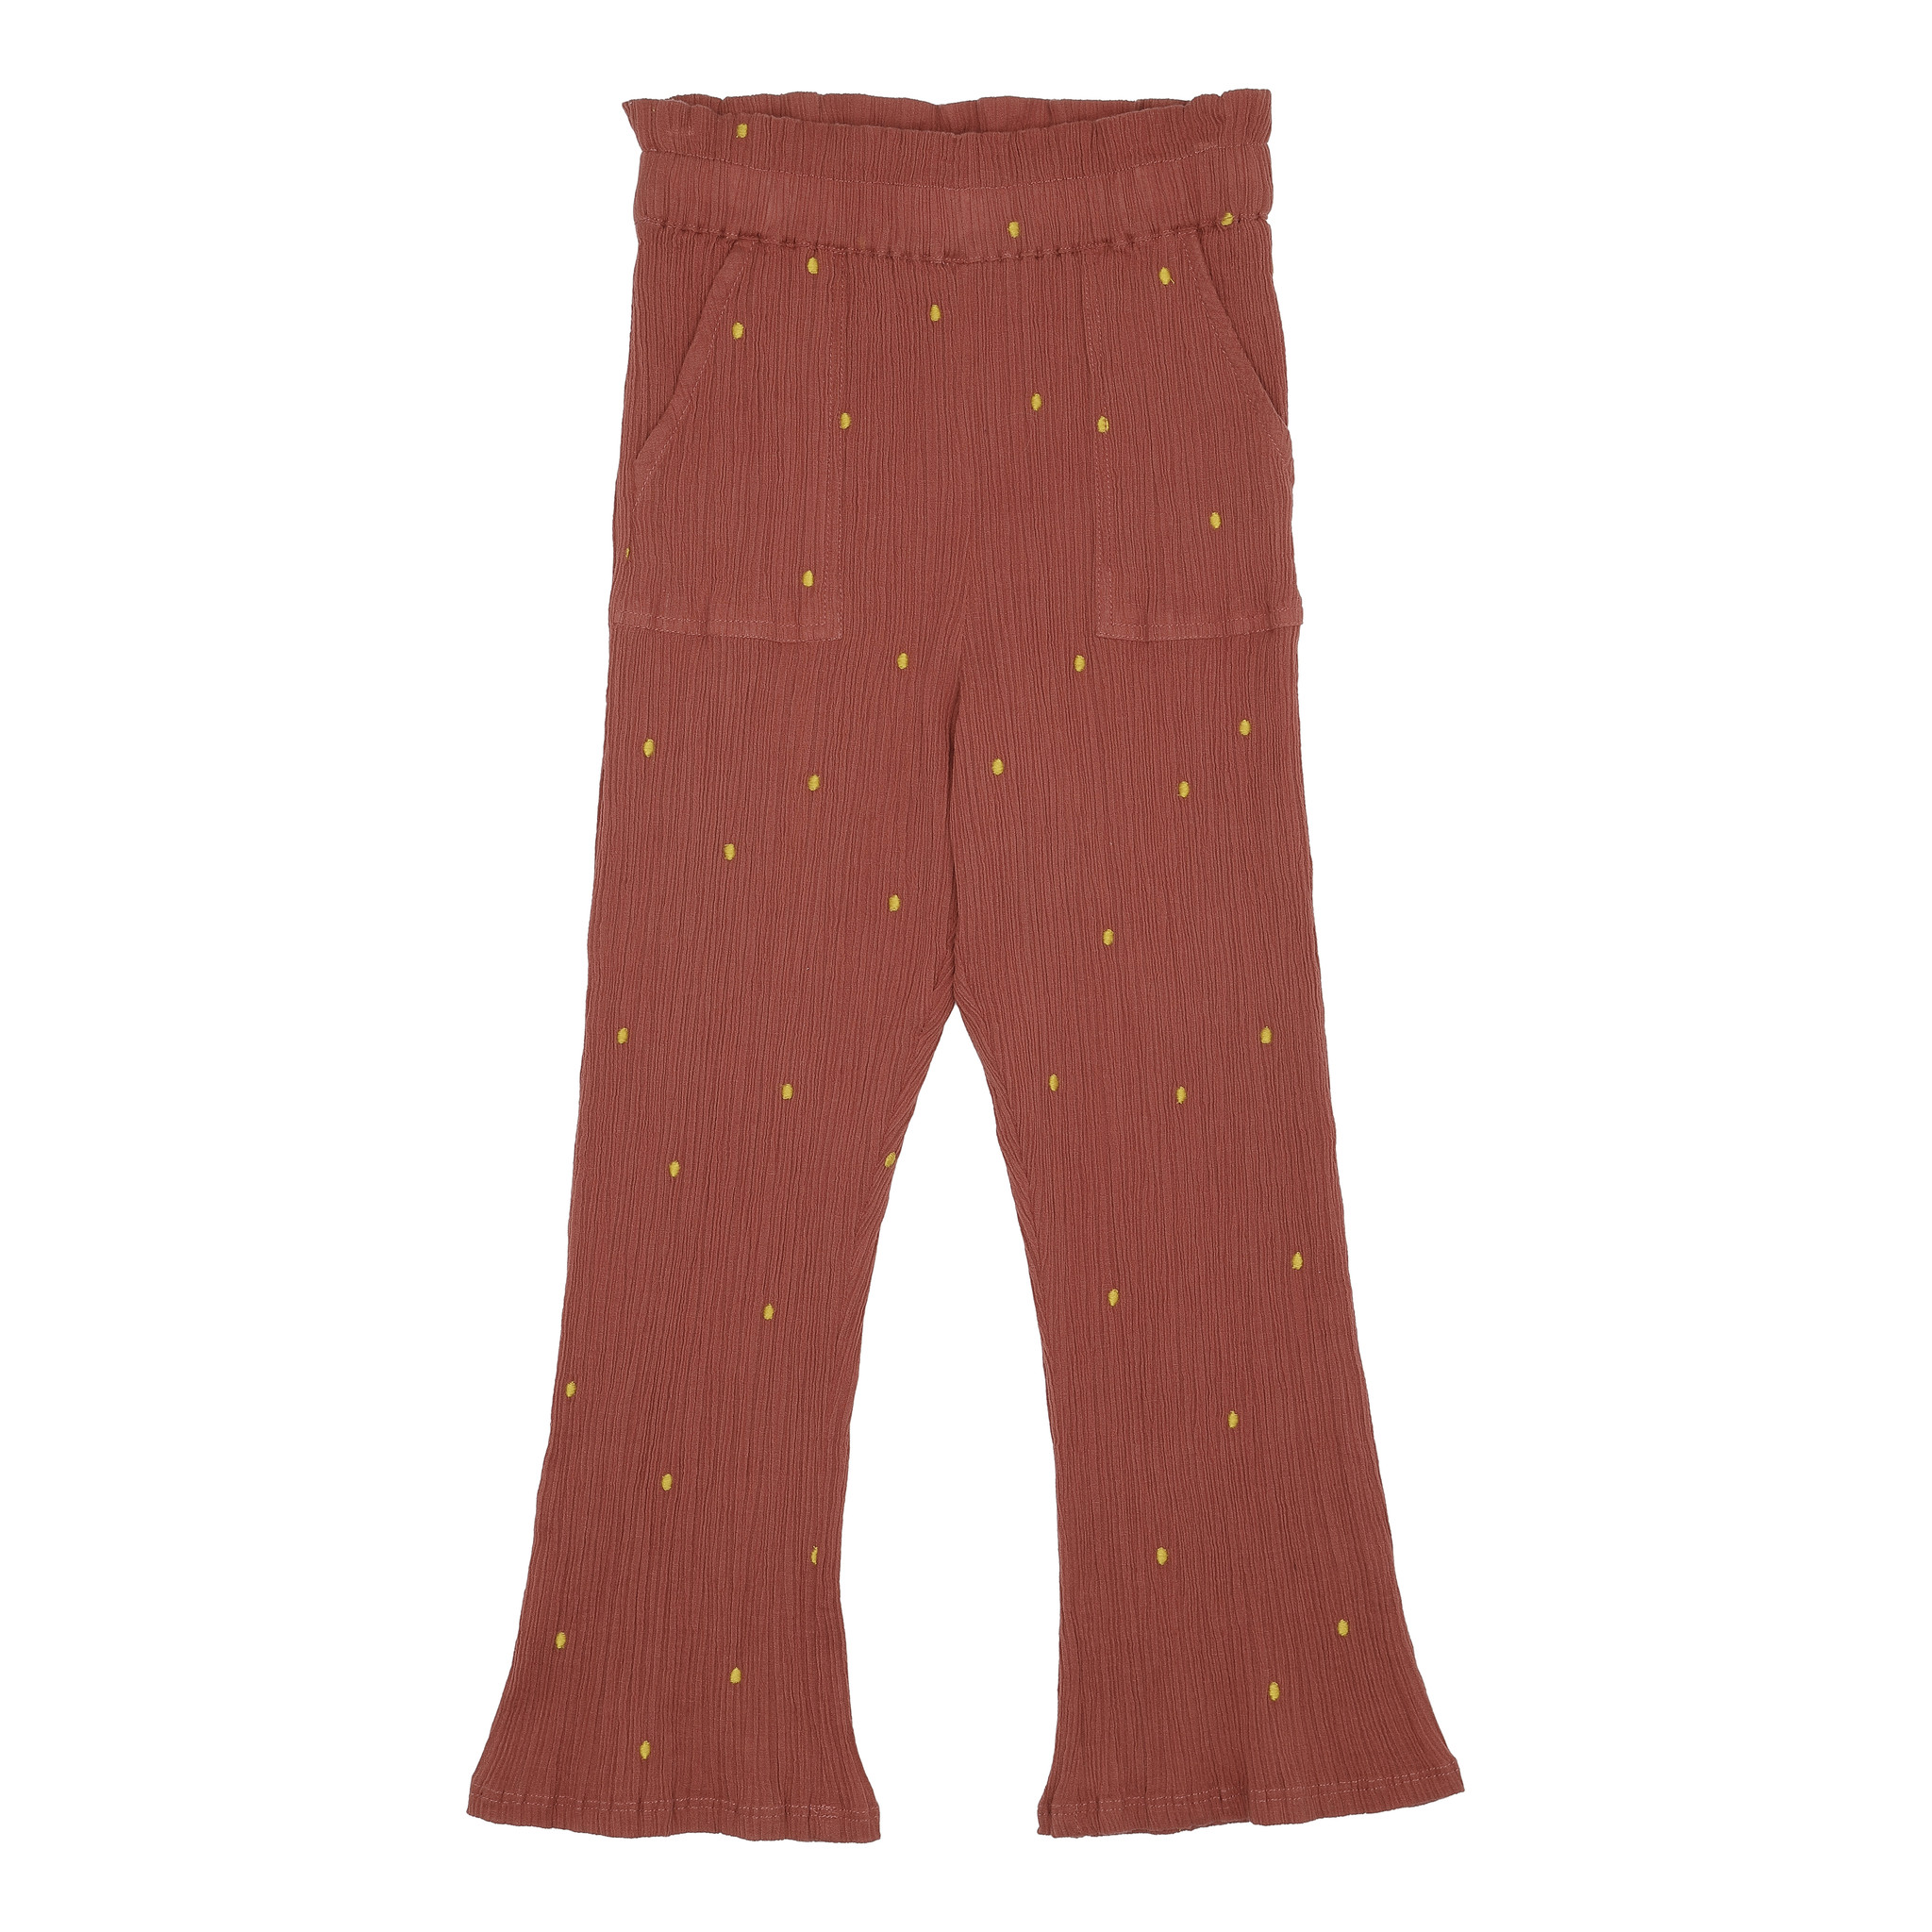 Francine pants - Cinnabar / AOP Dotty emb.-1